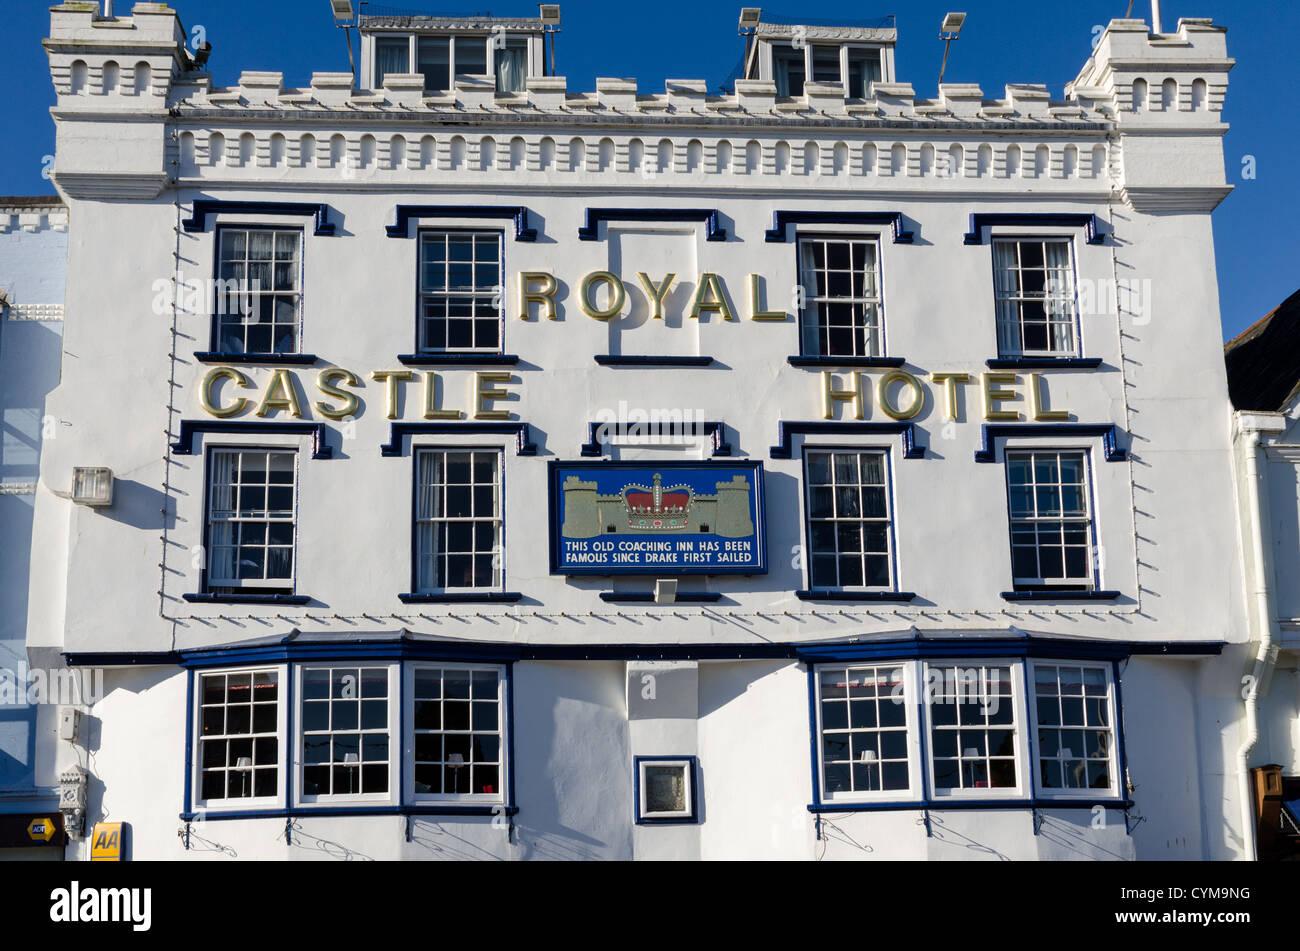 Royal Castle Hotel in Dartmouth, South Devon Stock Photo